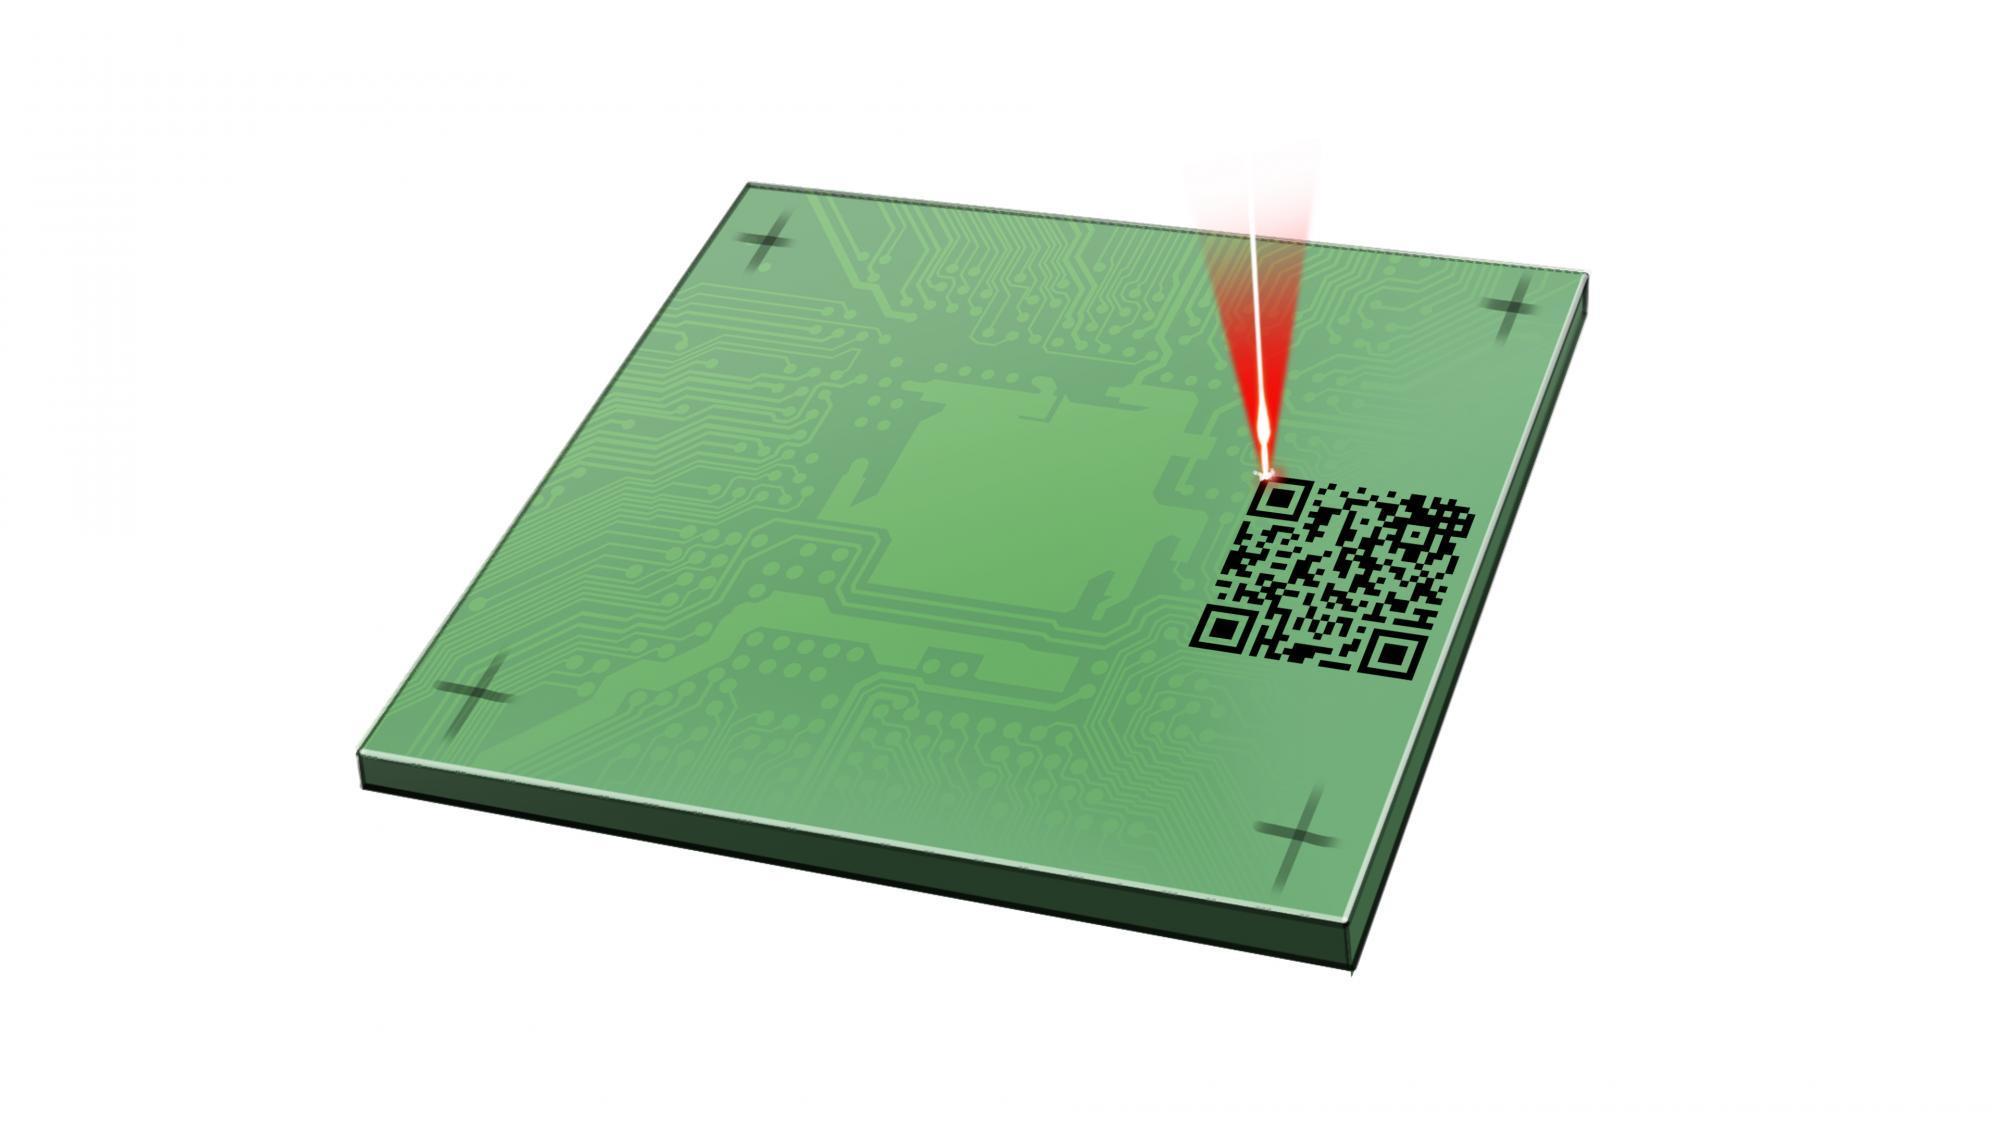 Laser Marking on PCB